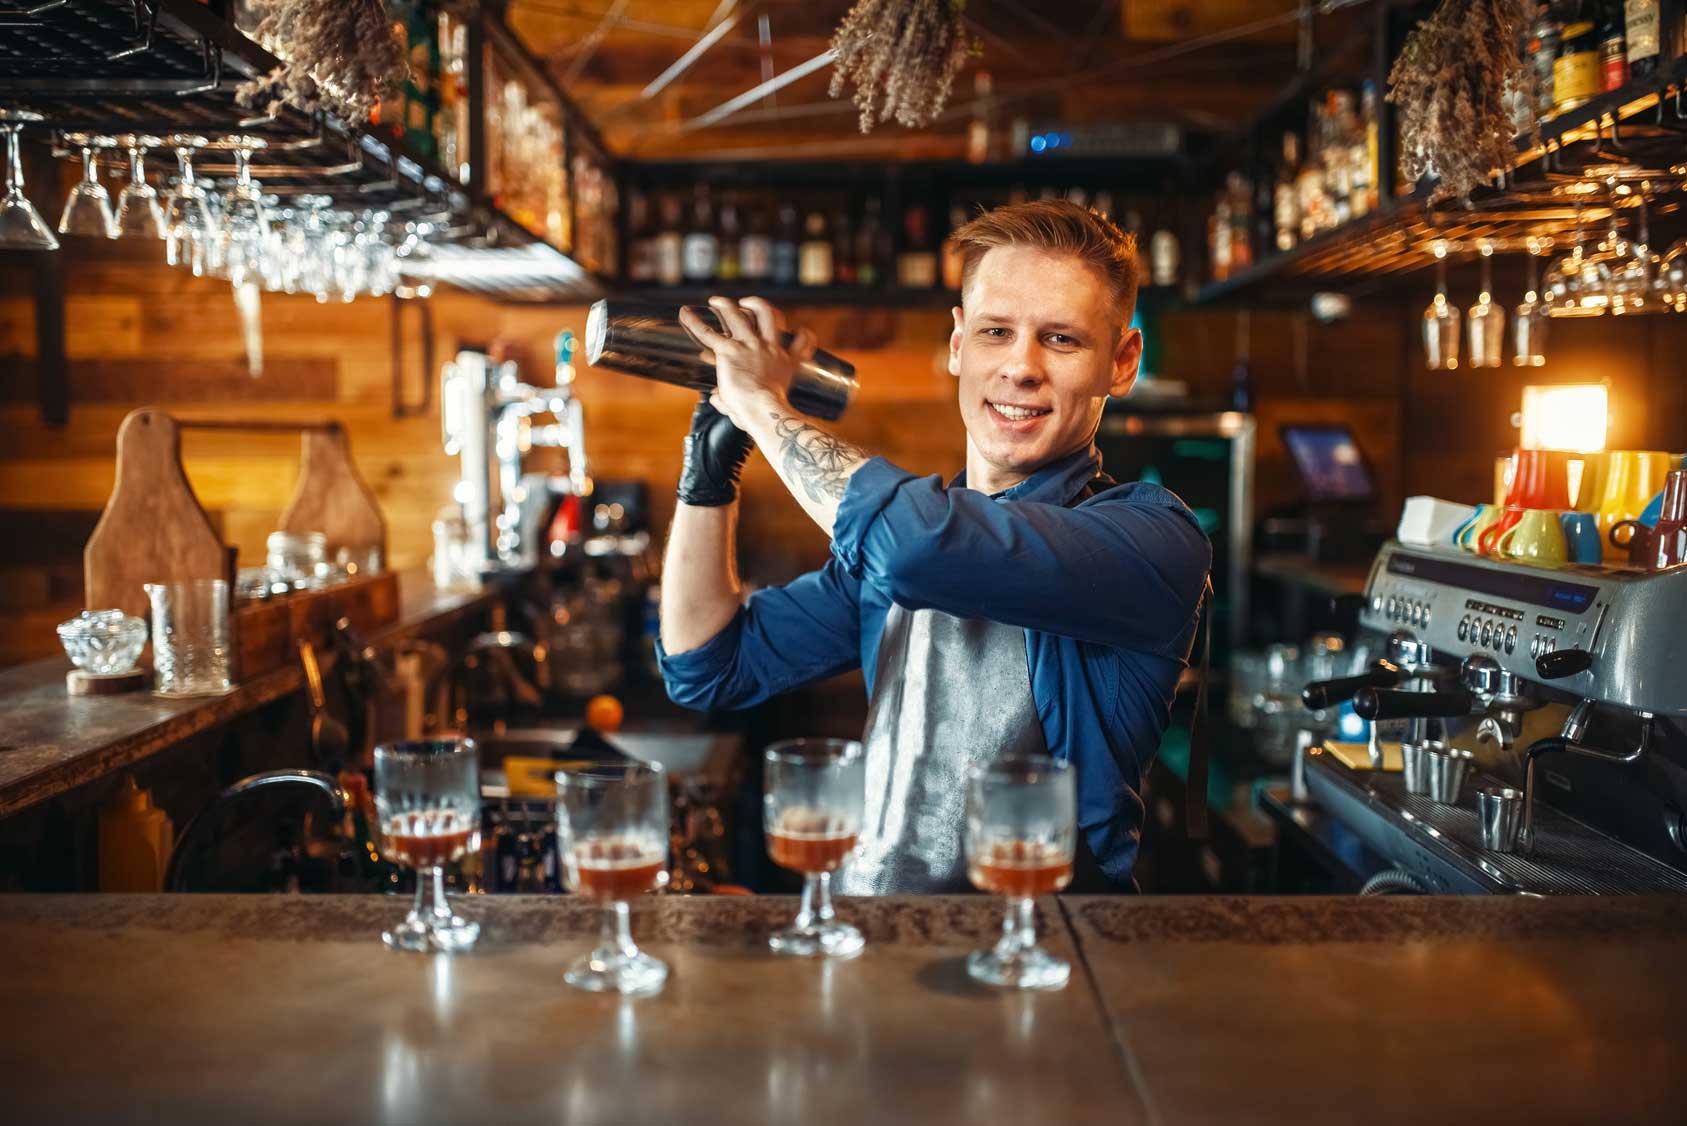 Bartender mit Cocktailshaker an der Bar - Cocktailkurs